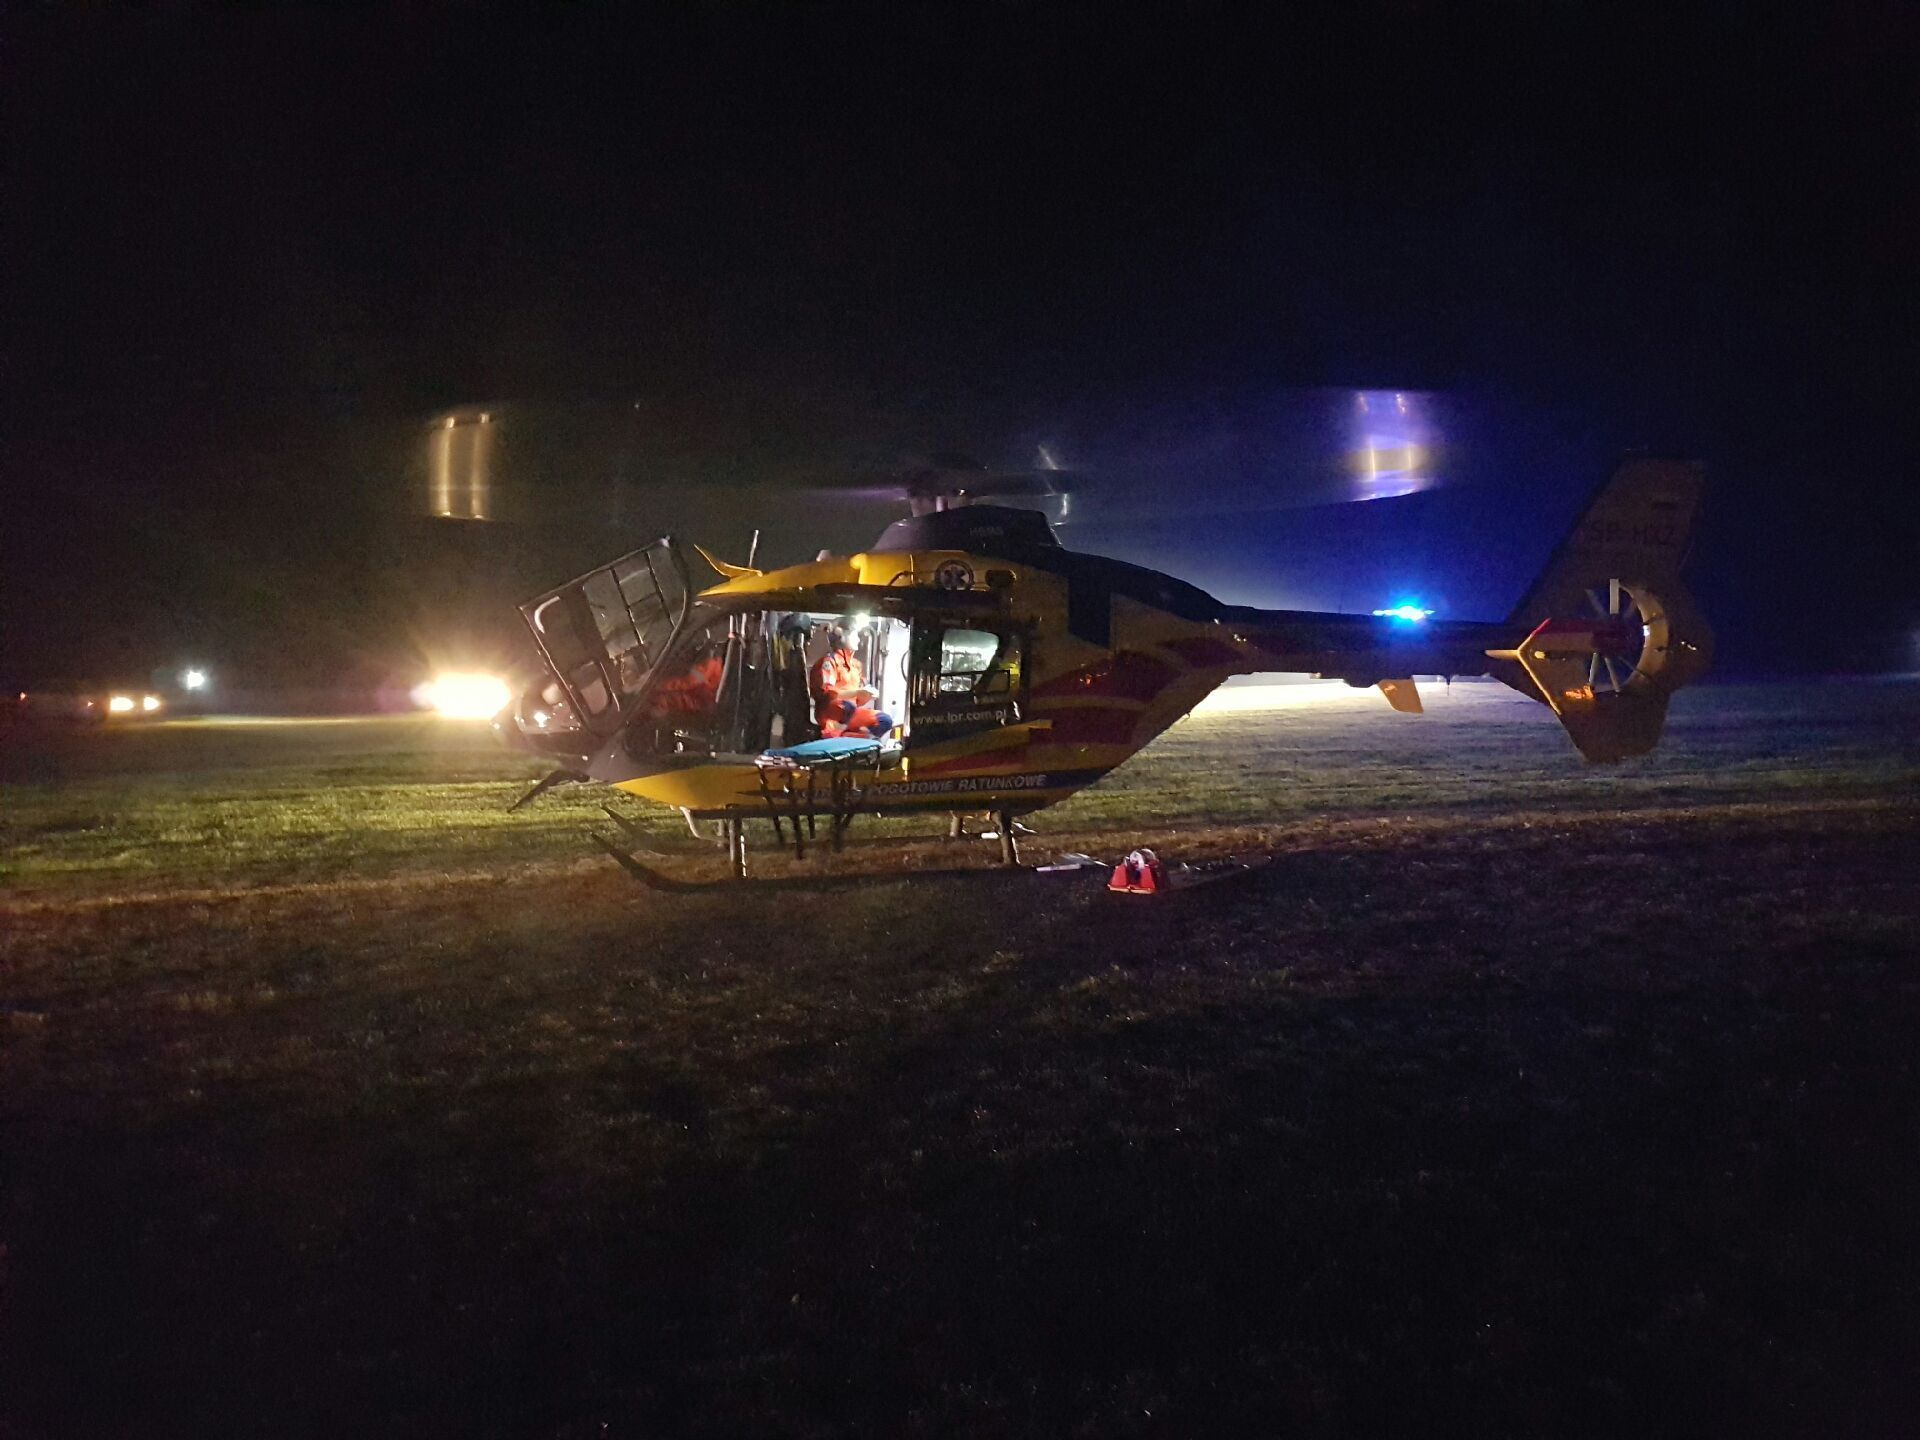 Poparzony 13-latek zabrany śmigłowcem do szpitala